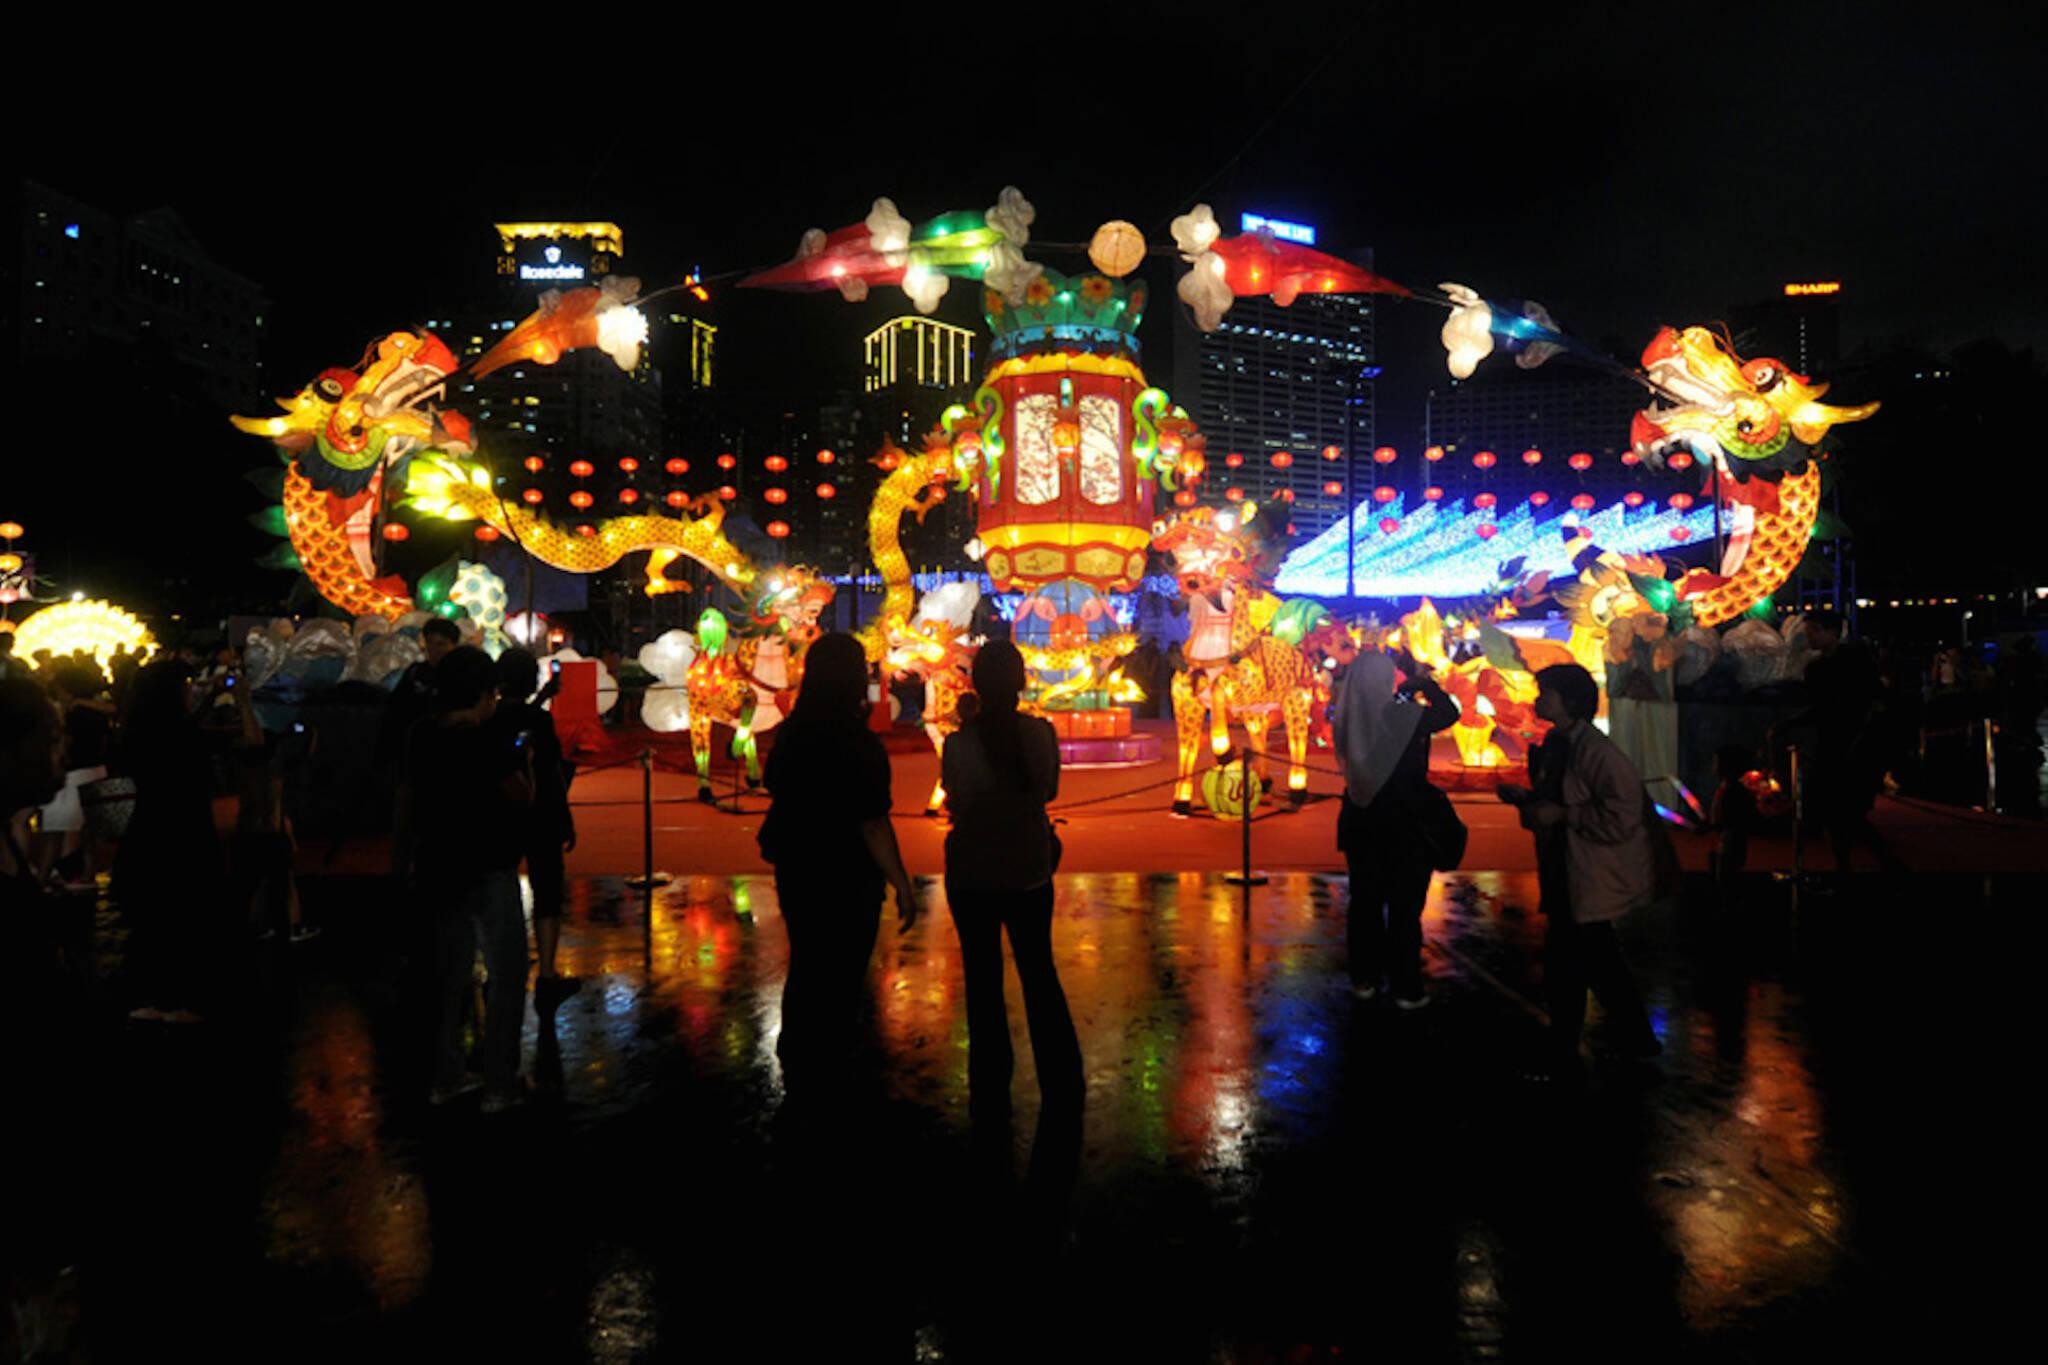 CNE Lantern Festival